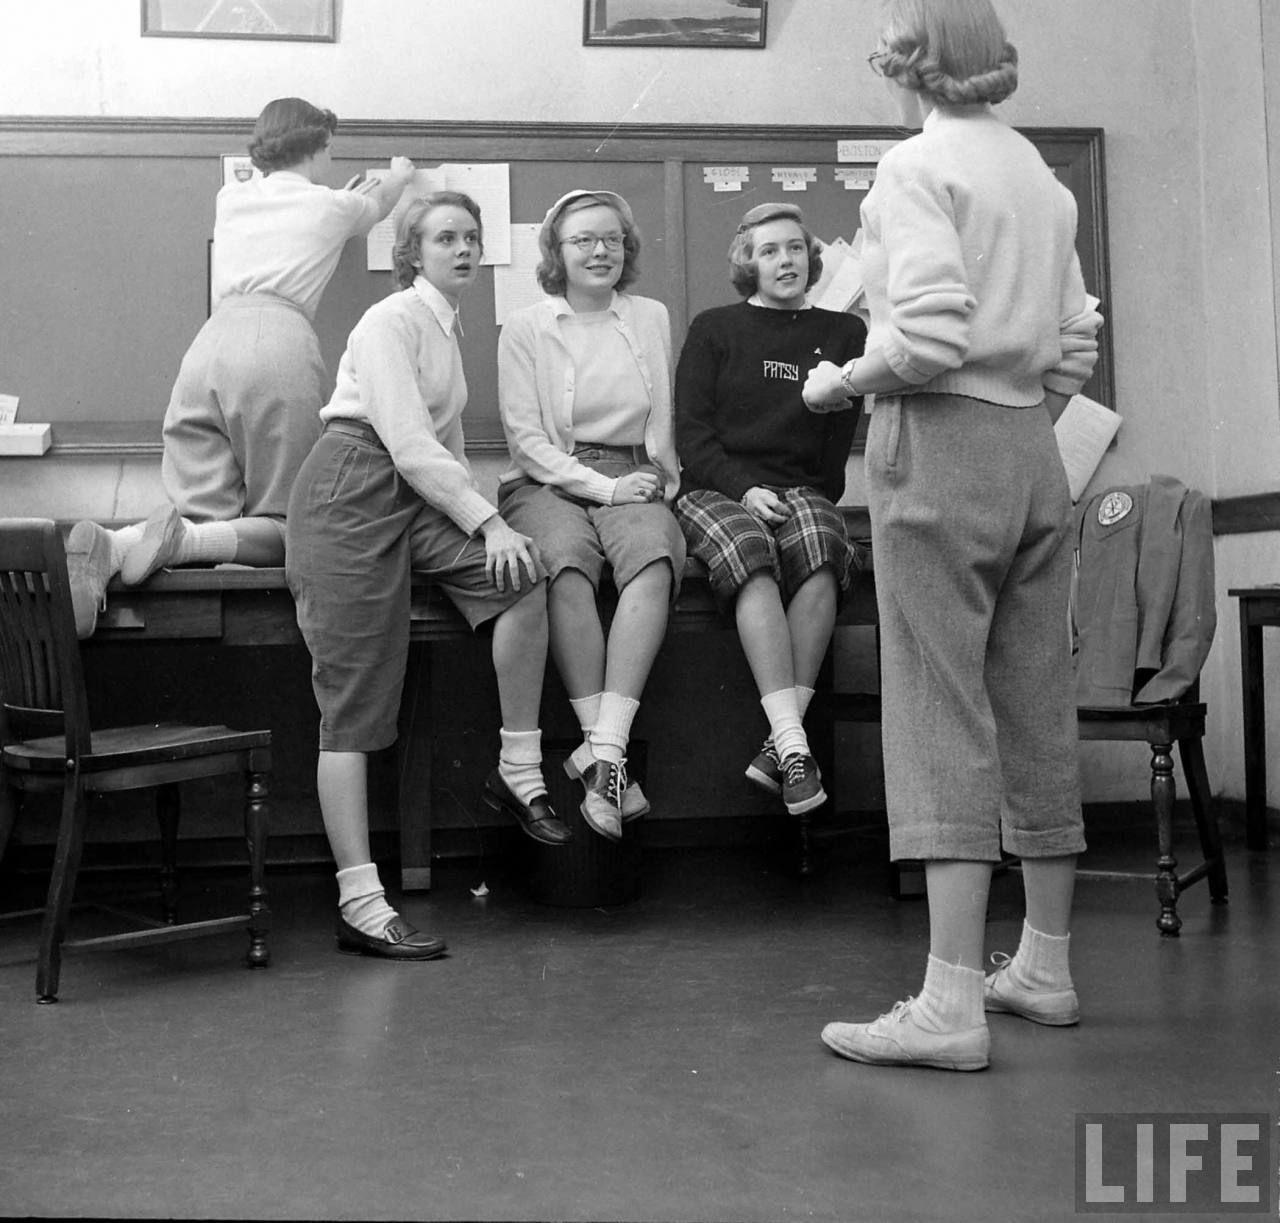 October 10, 1949, nina leen photography - Google Search